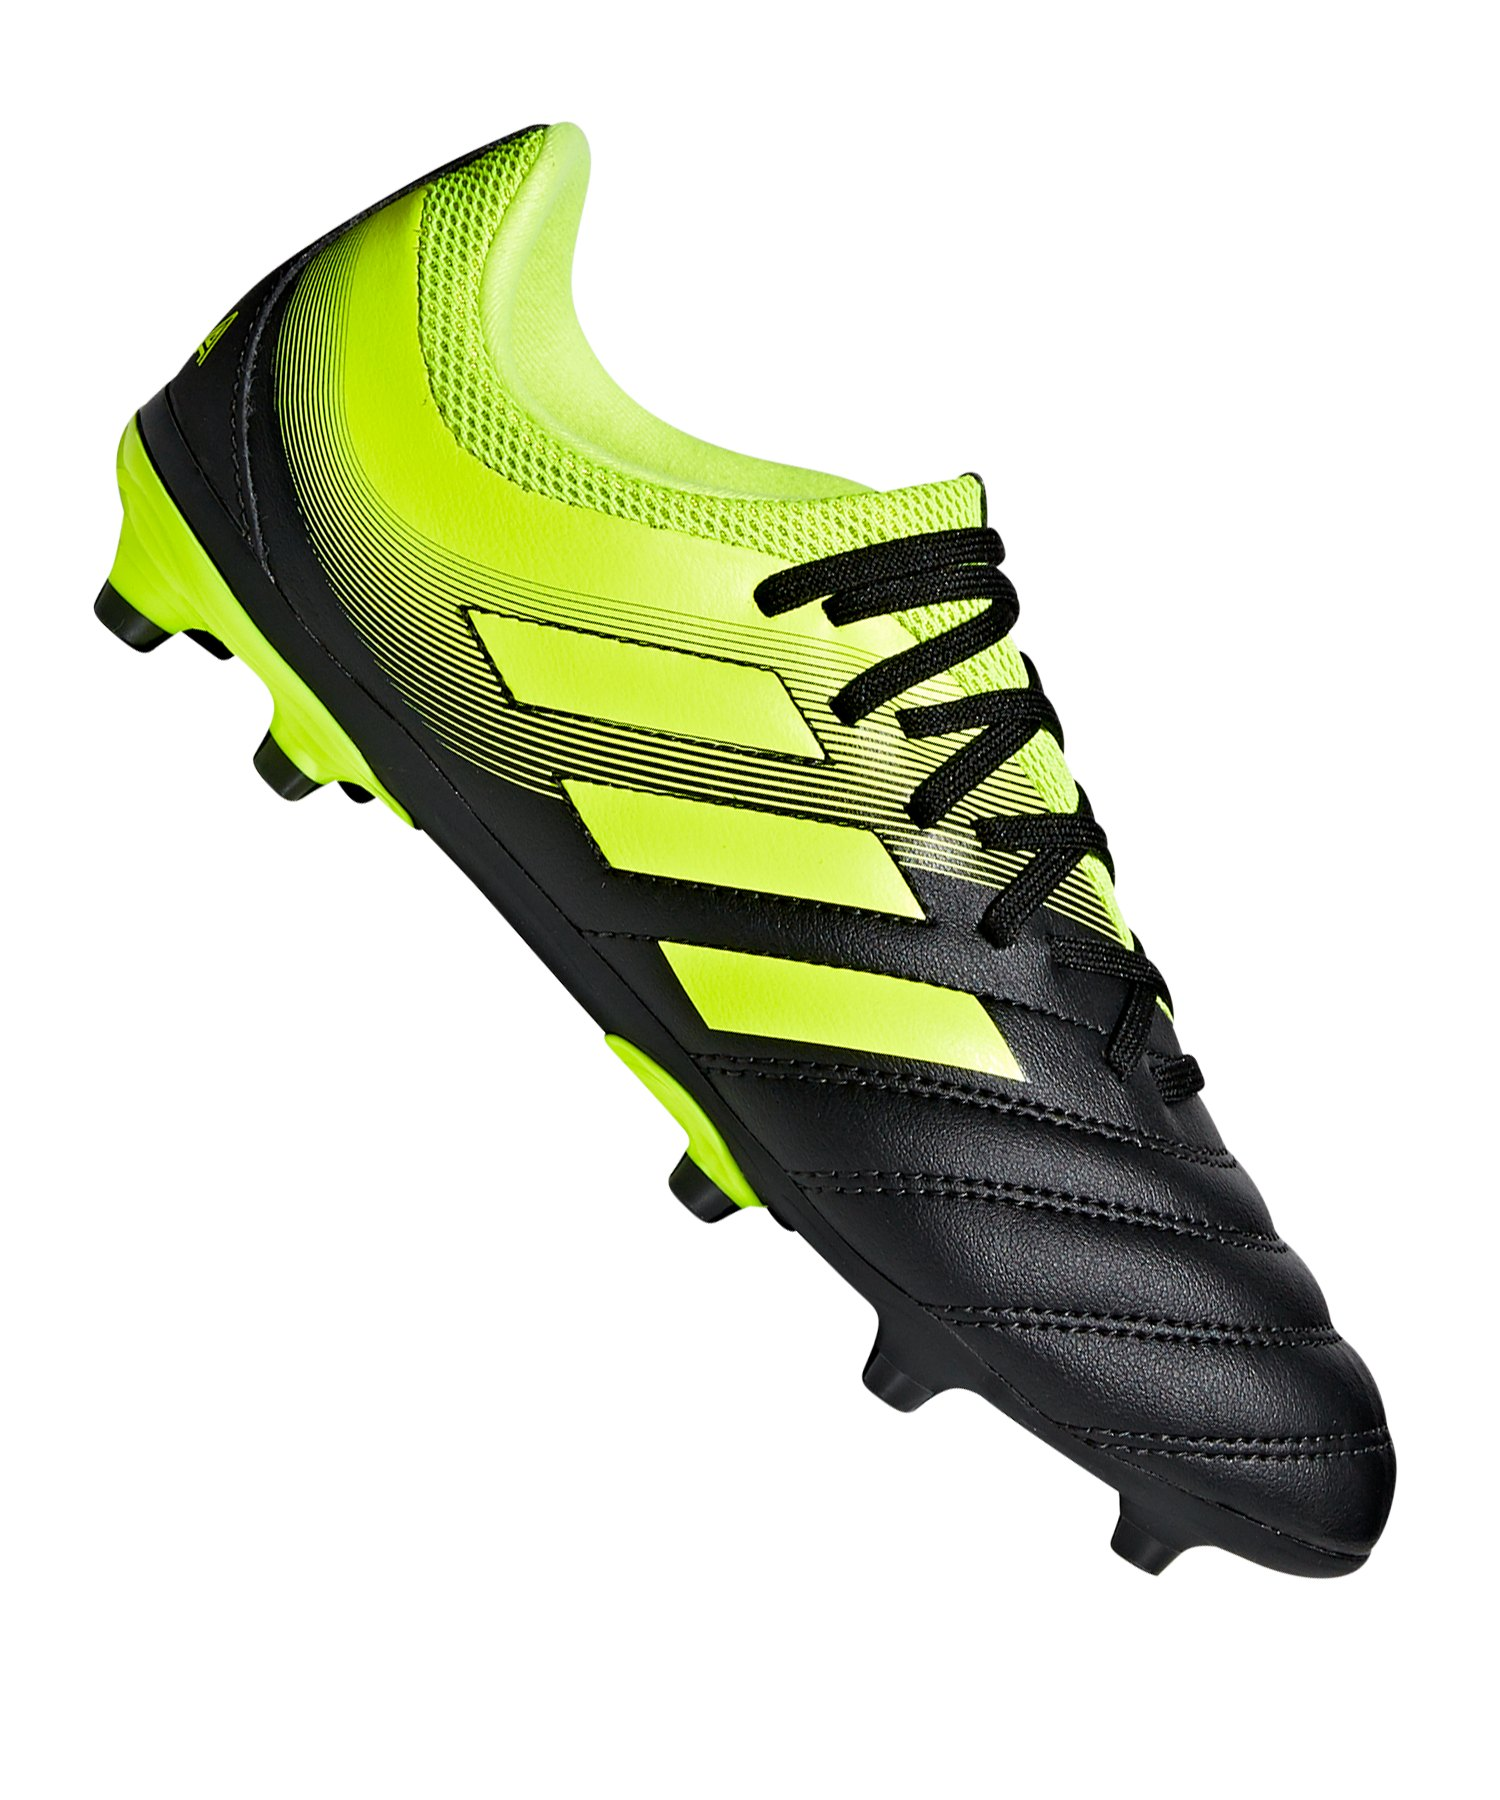 Fg 3 J Adidas 19 Kids Schwarz Gelb Copa 35AjRL4